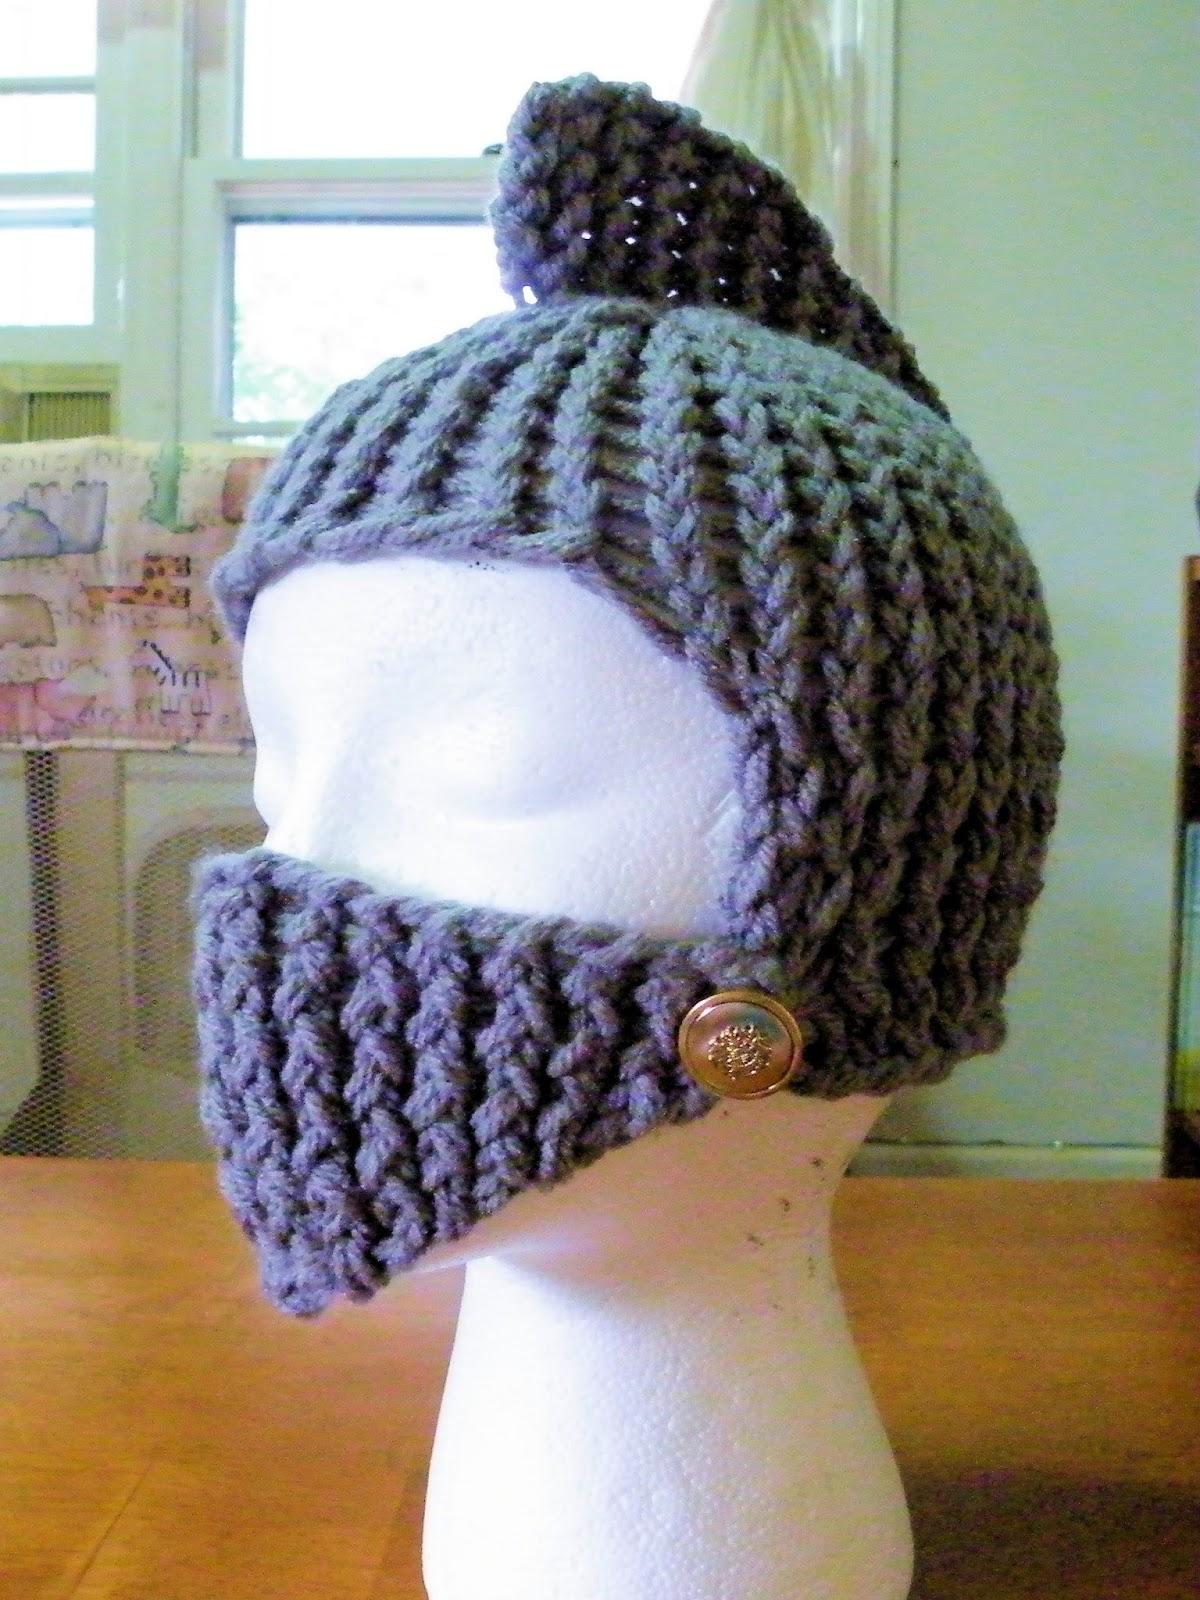 Crochet Knight Helmet Hat Pattern Free American Bathtub Refinishers